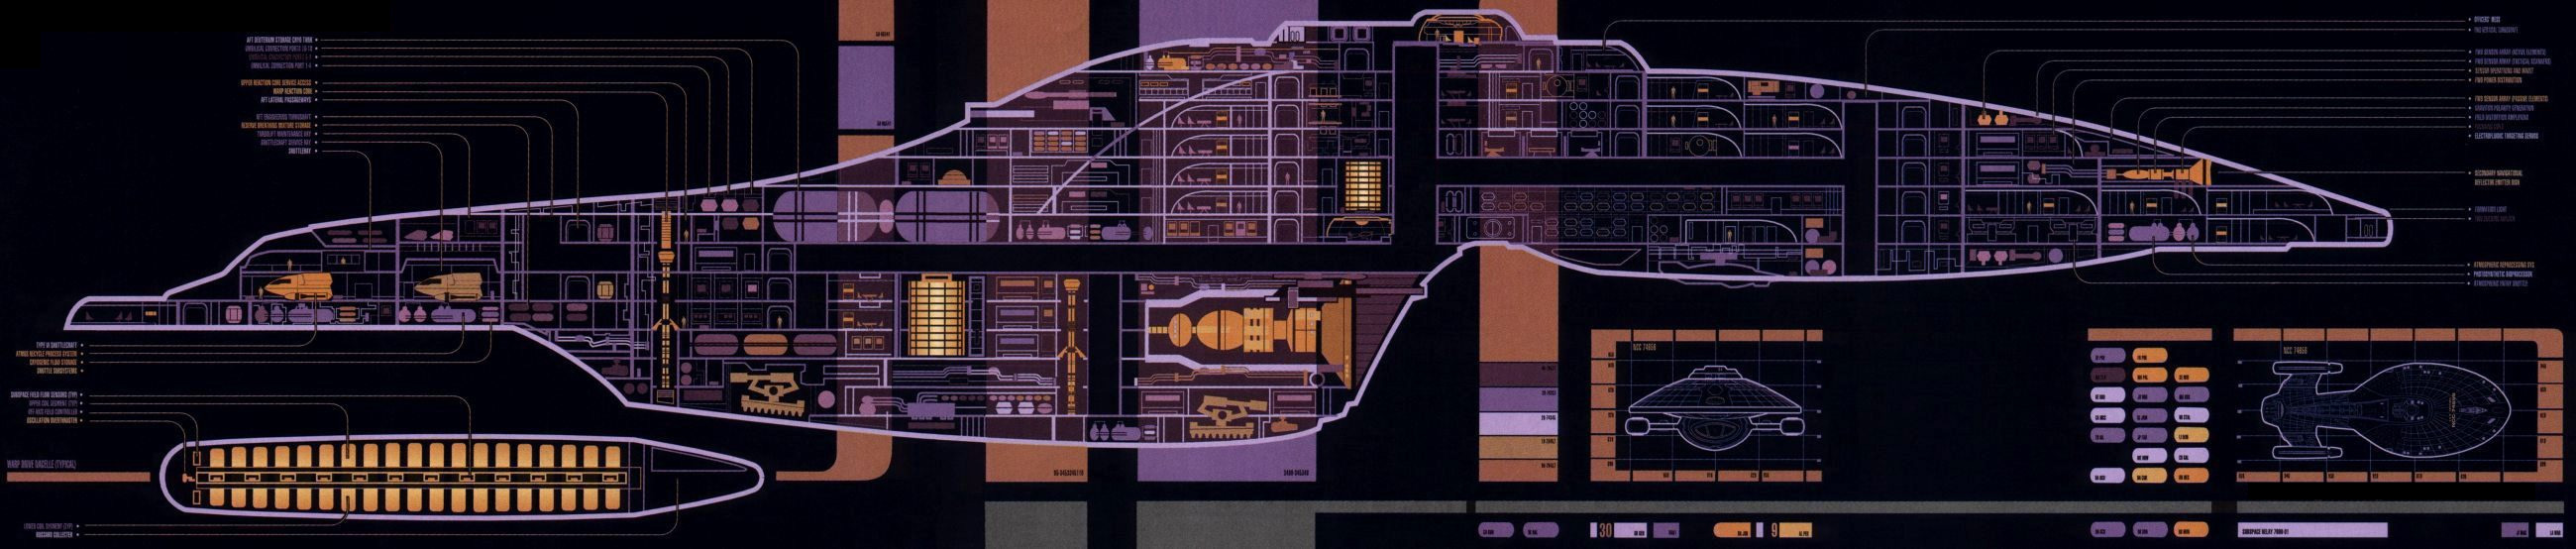 FRIQUIS SPACE (CUADERNO DE VITACORAS) Intrepid_class_MSD